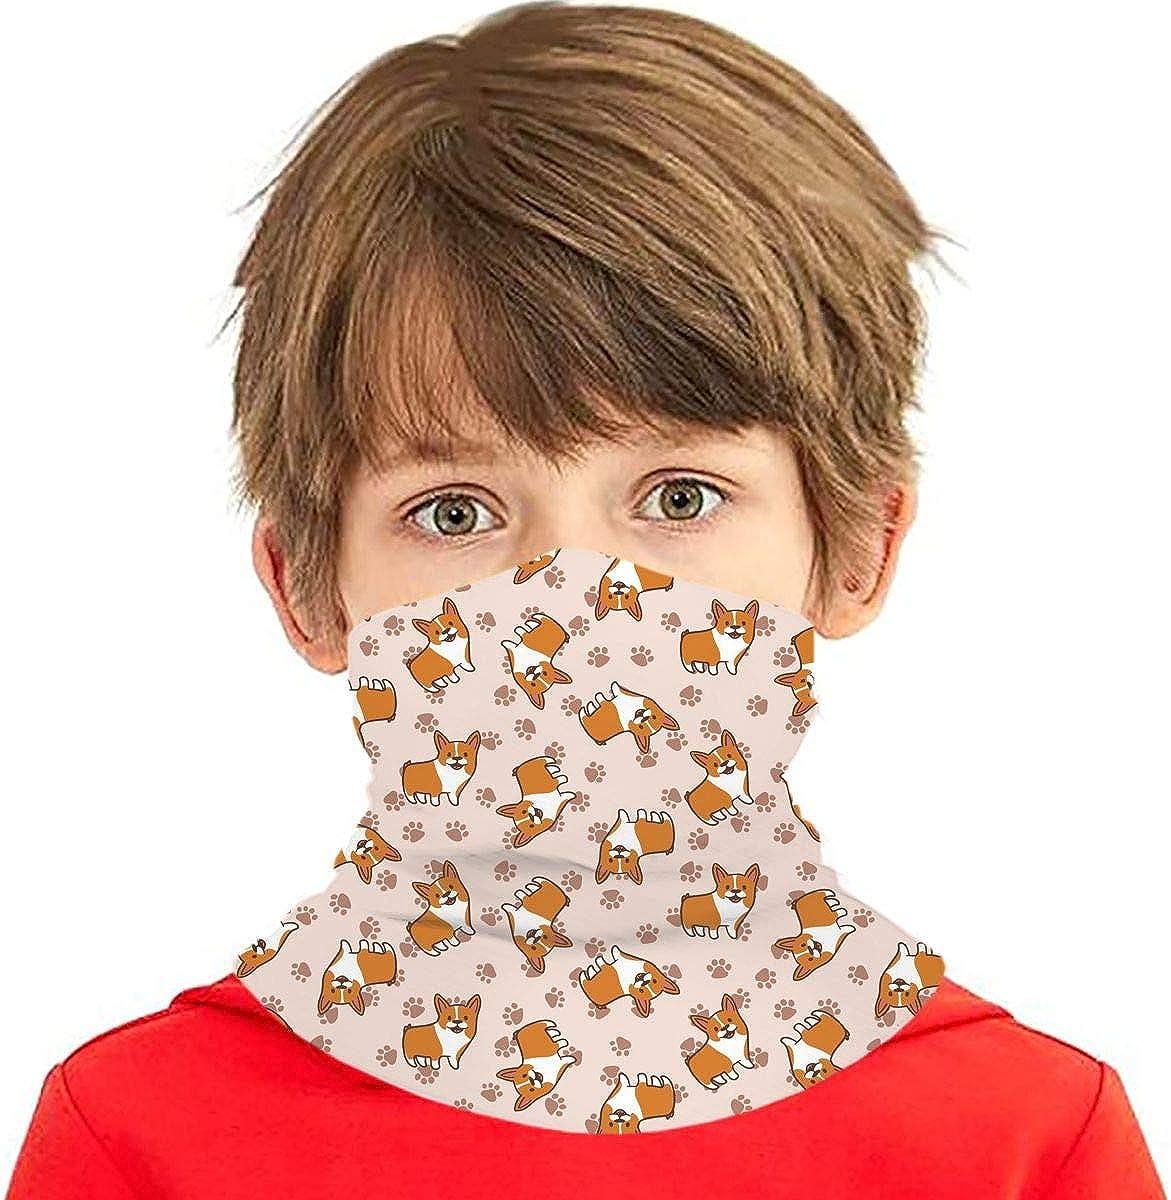 Dujiea Kids Bandanas Face Mask, Corgi Dog Paw Print Dust Sun UV Protection Neck Gaiter Multifunctional Balaclava Face Scarf Summer Tube Headband Lightweight for Boys Girls Outdoors